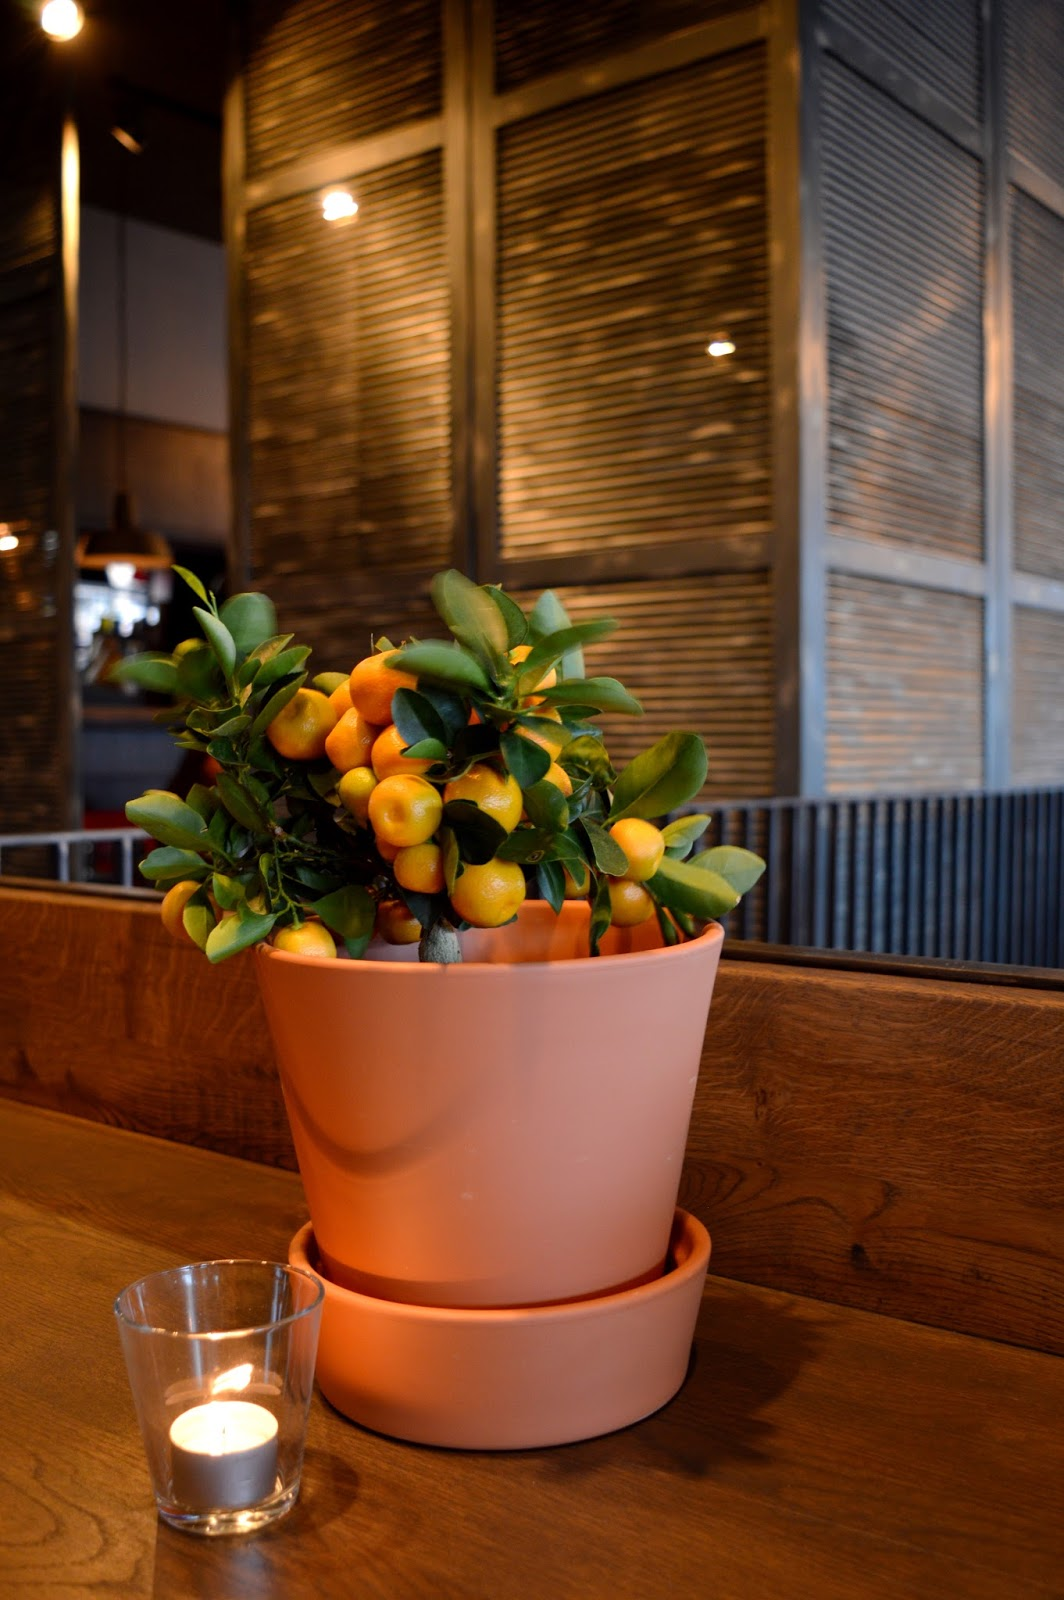 L'Osteria Southampton Review, L'Osteria Southampton, Hampshire bloggers, places to eat Southampton